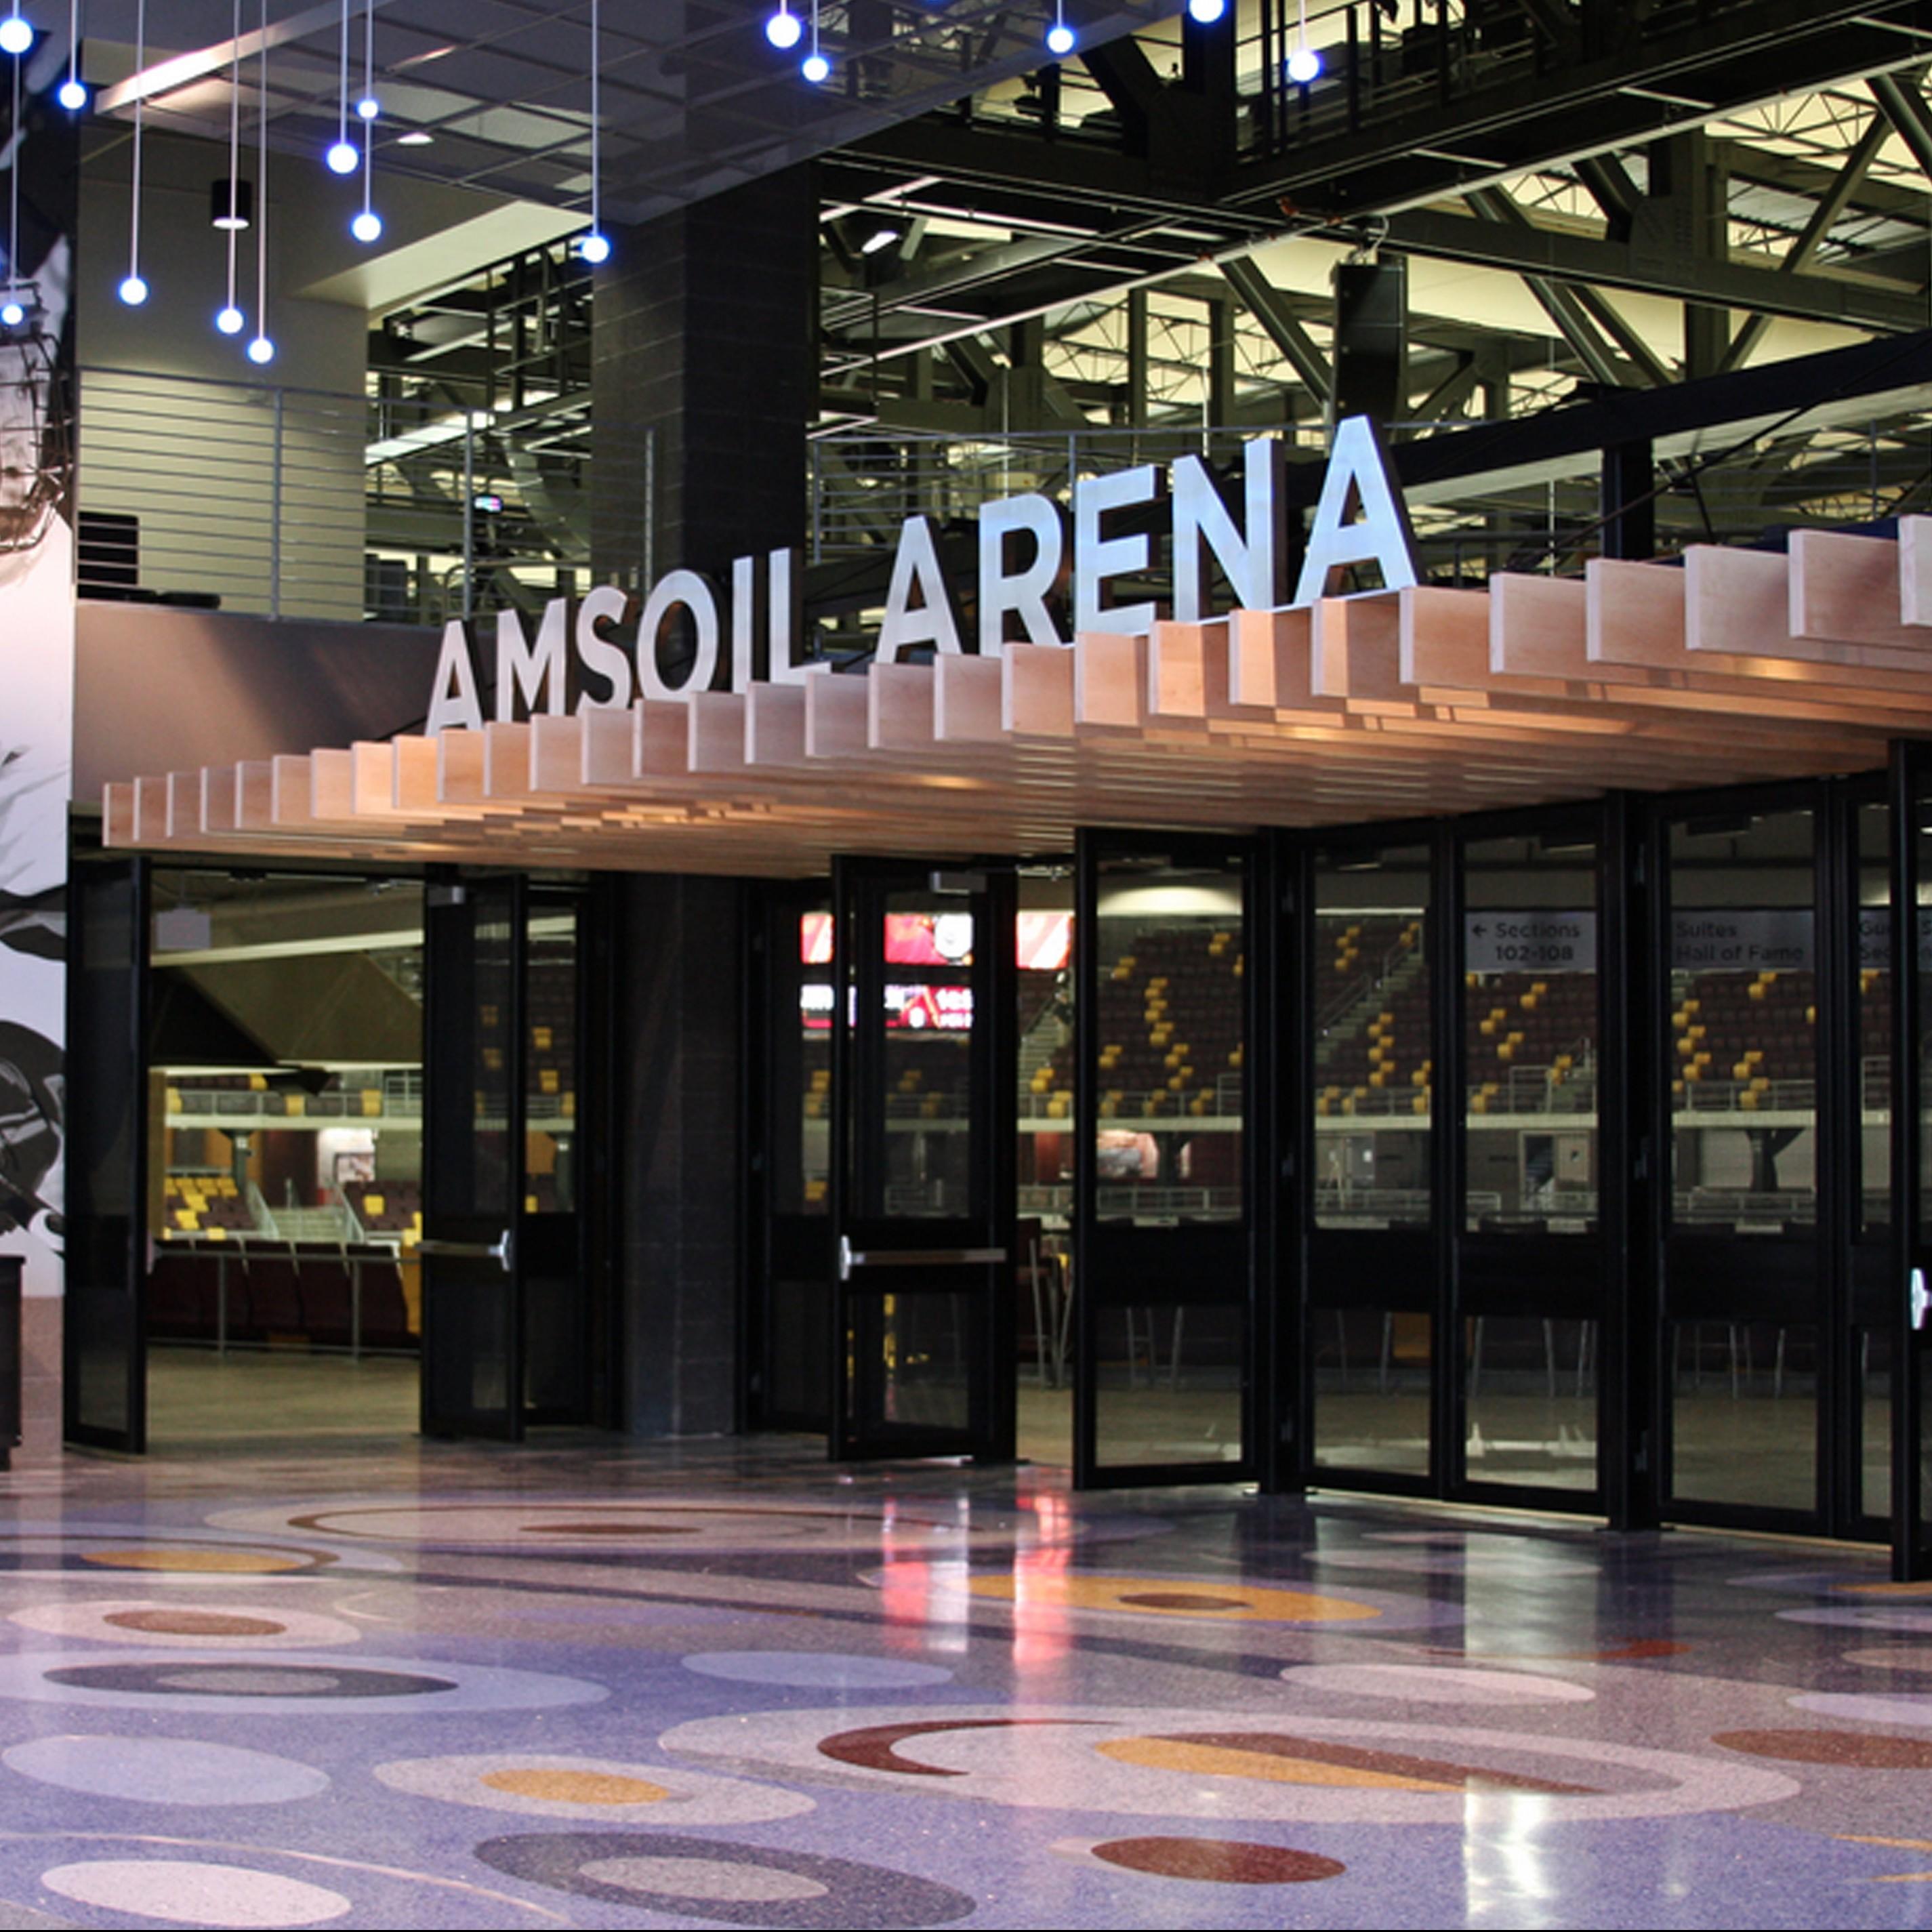 Amsoil Arena entrance